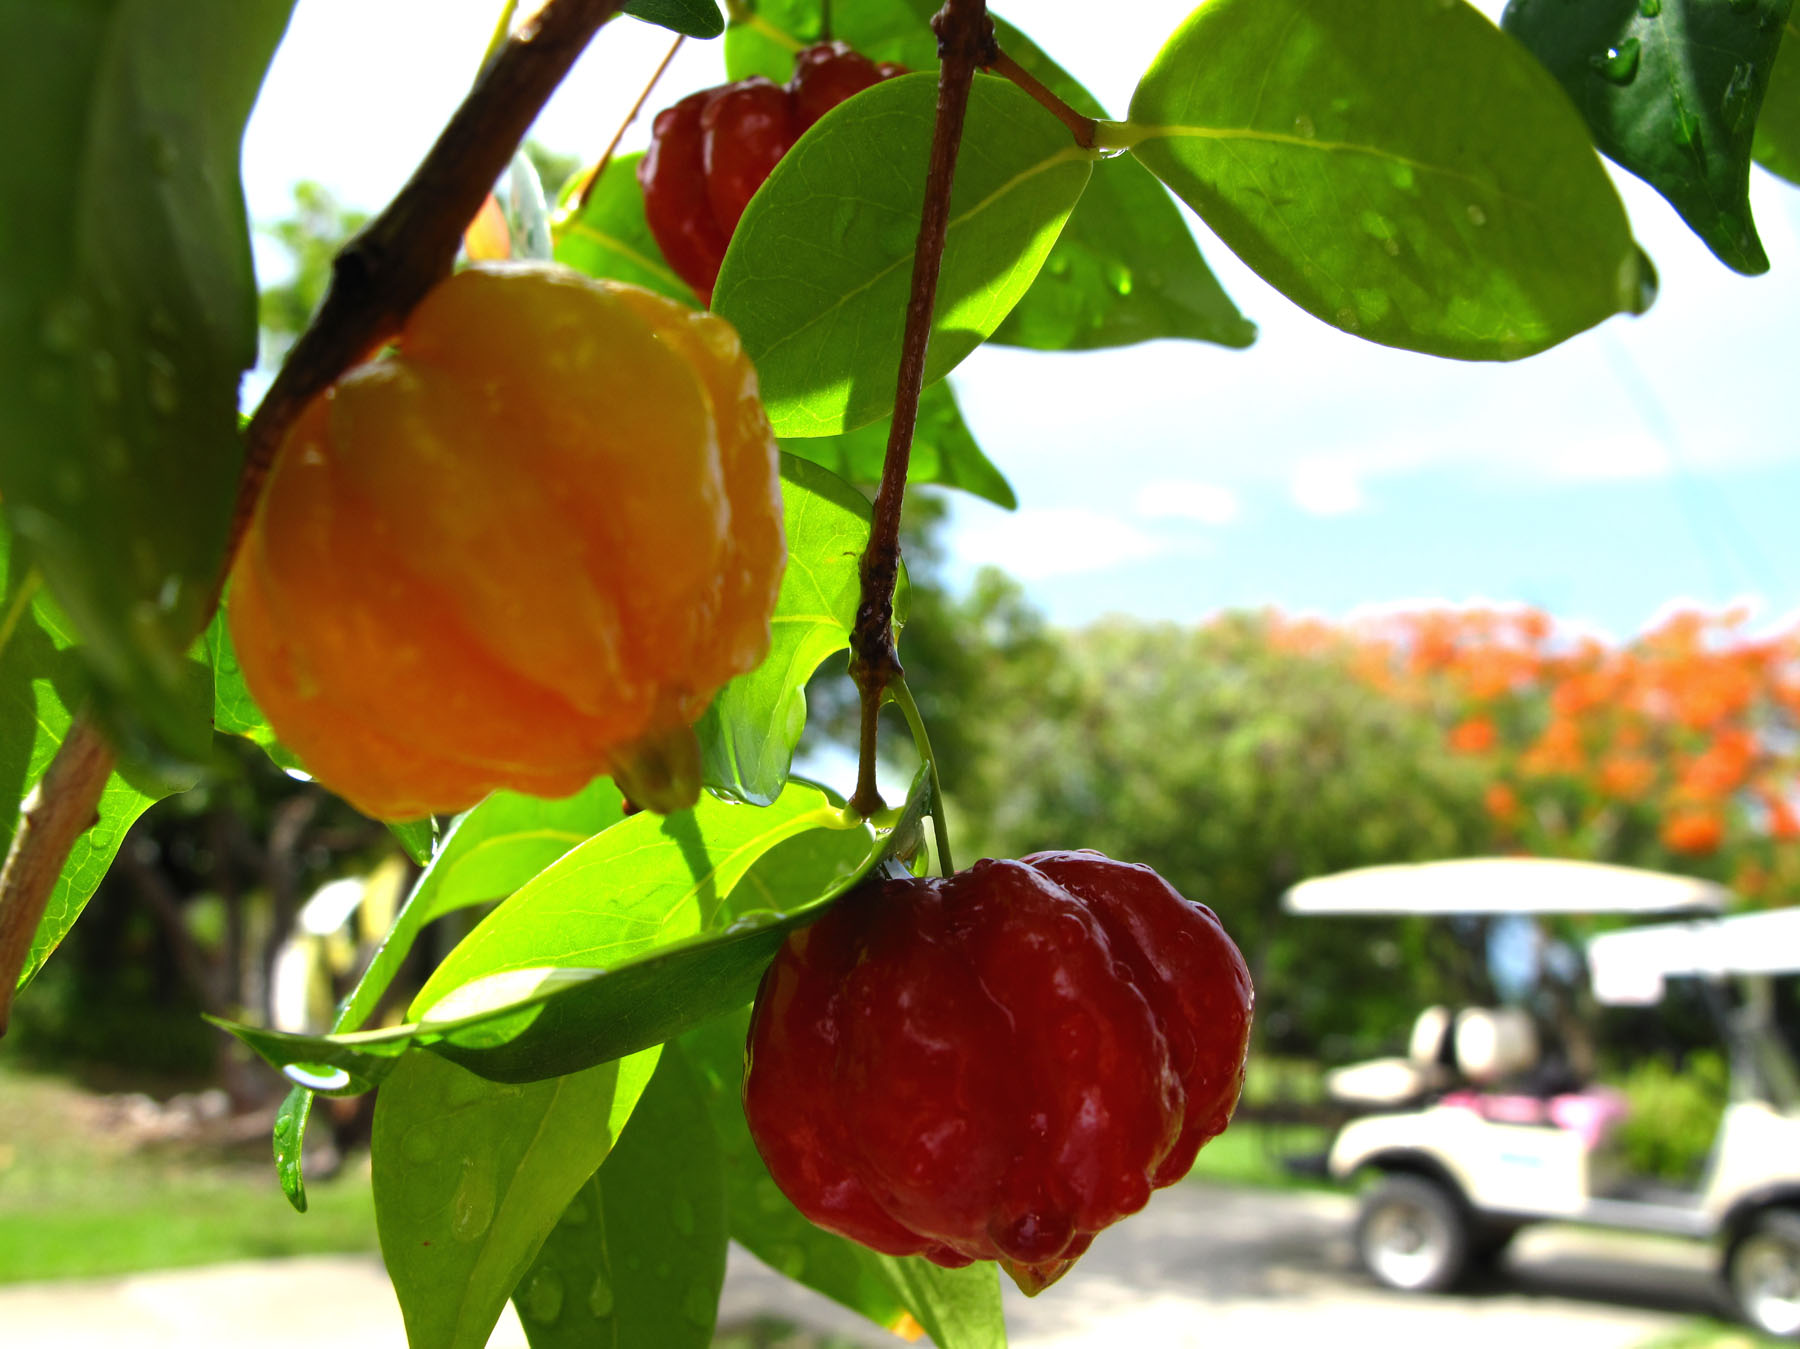 bahamas, abaco, green turtle cay, barbados cherry